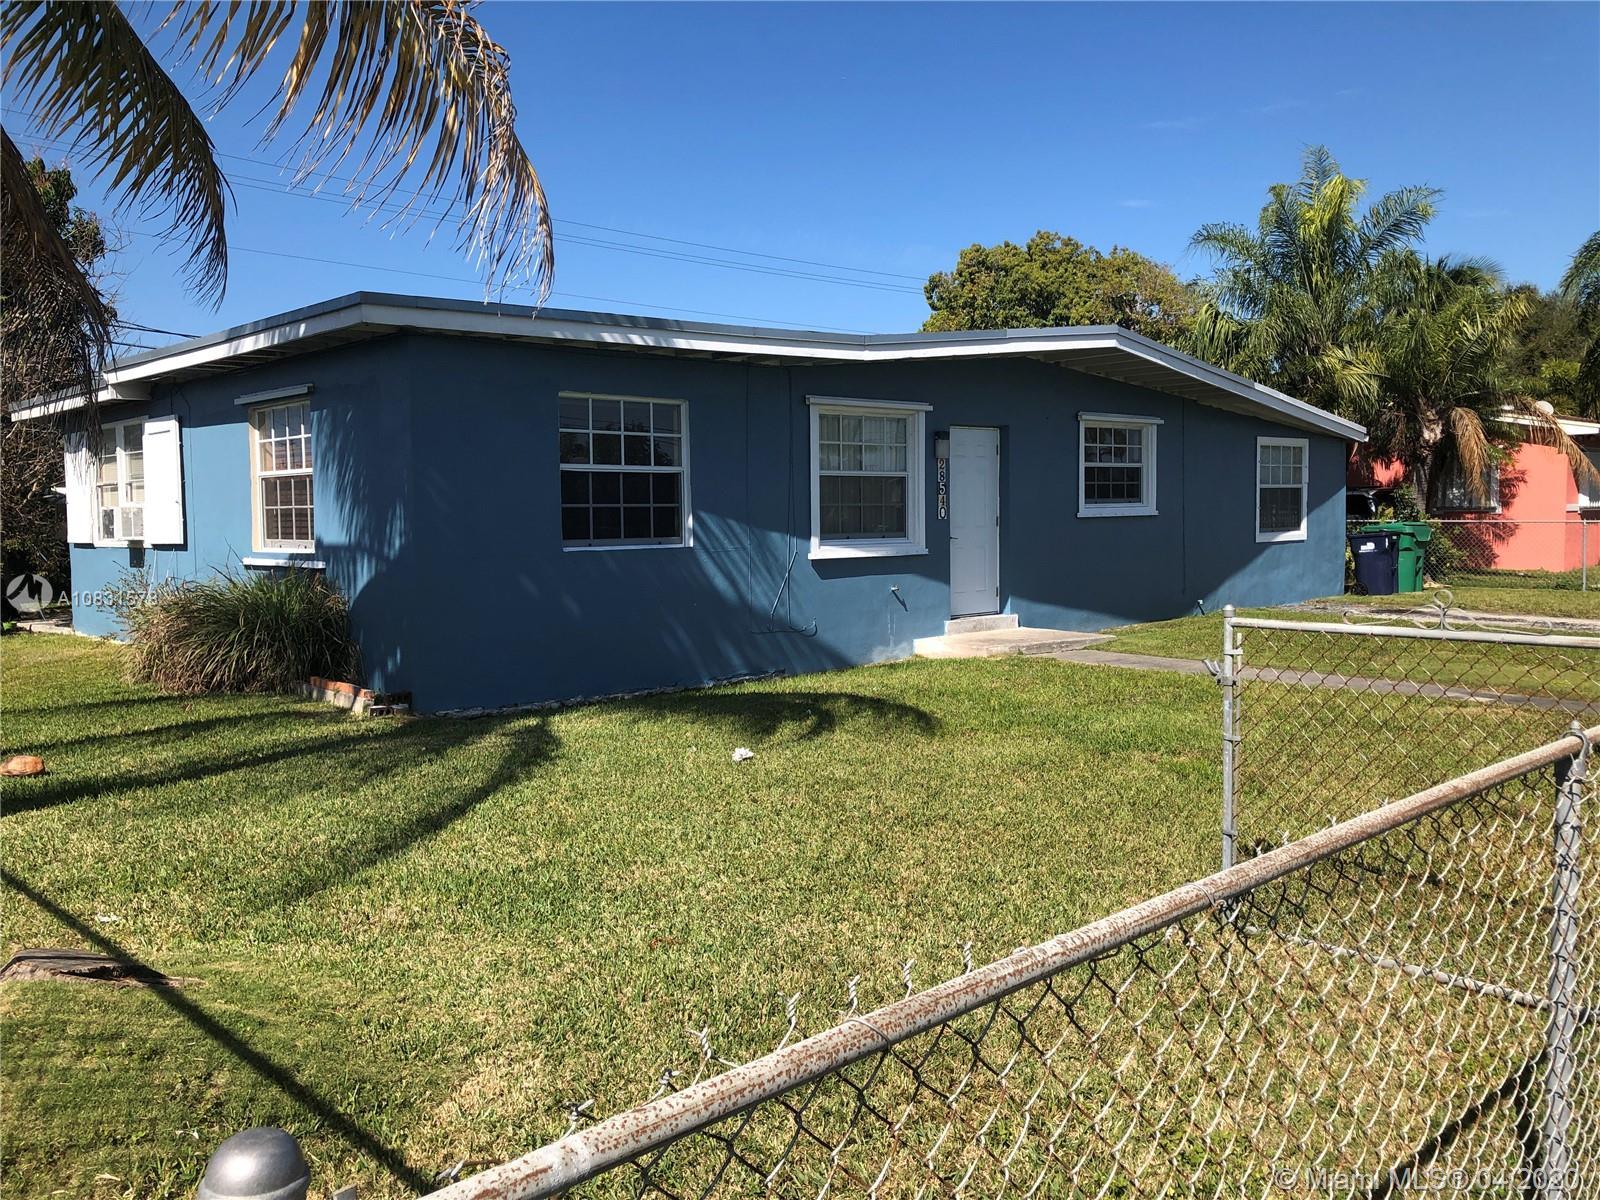 28540 SW 144th Ave, Homestead, FL 33033 - Homestead, FL real estate listing